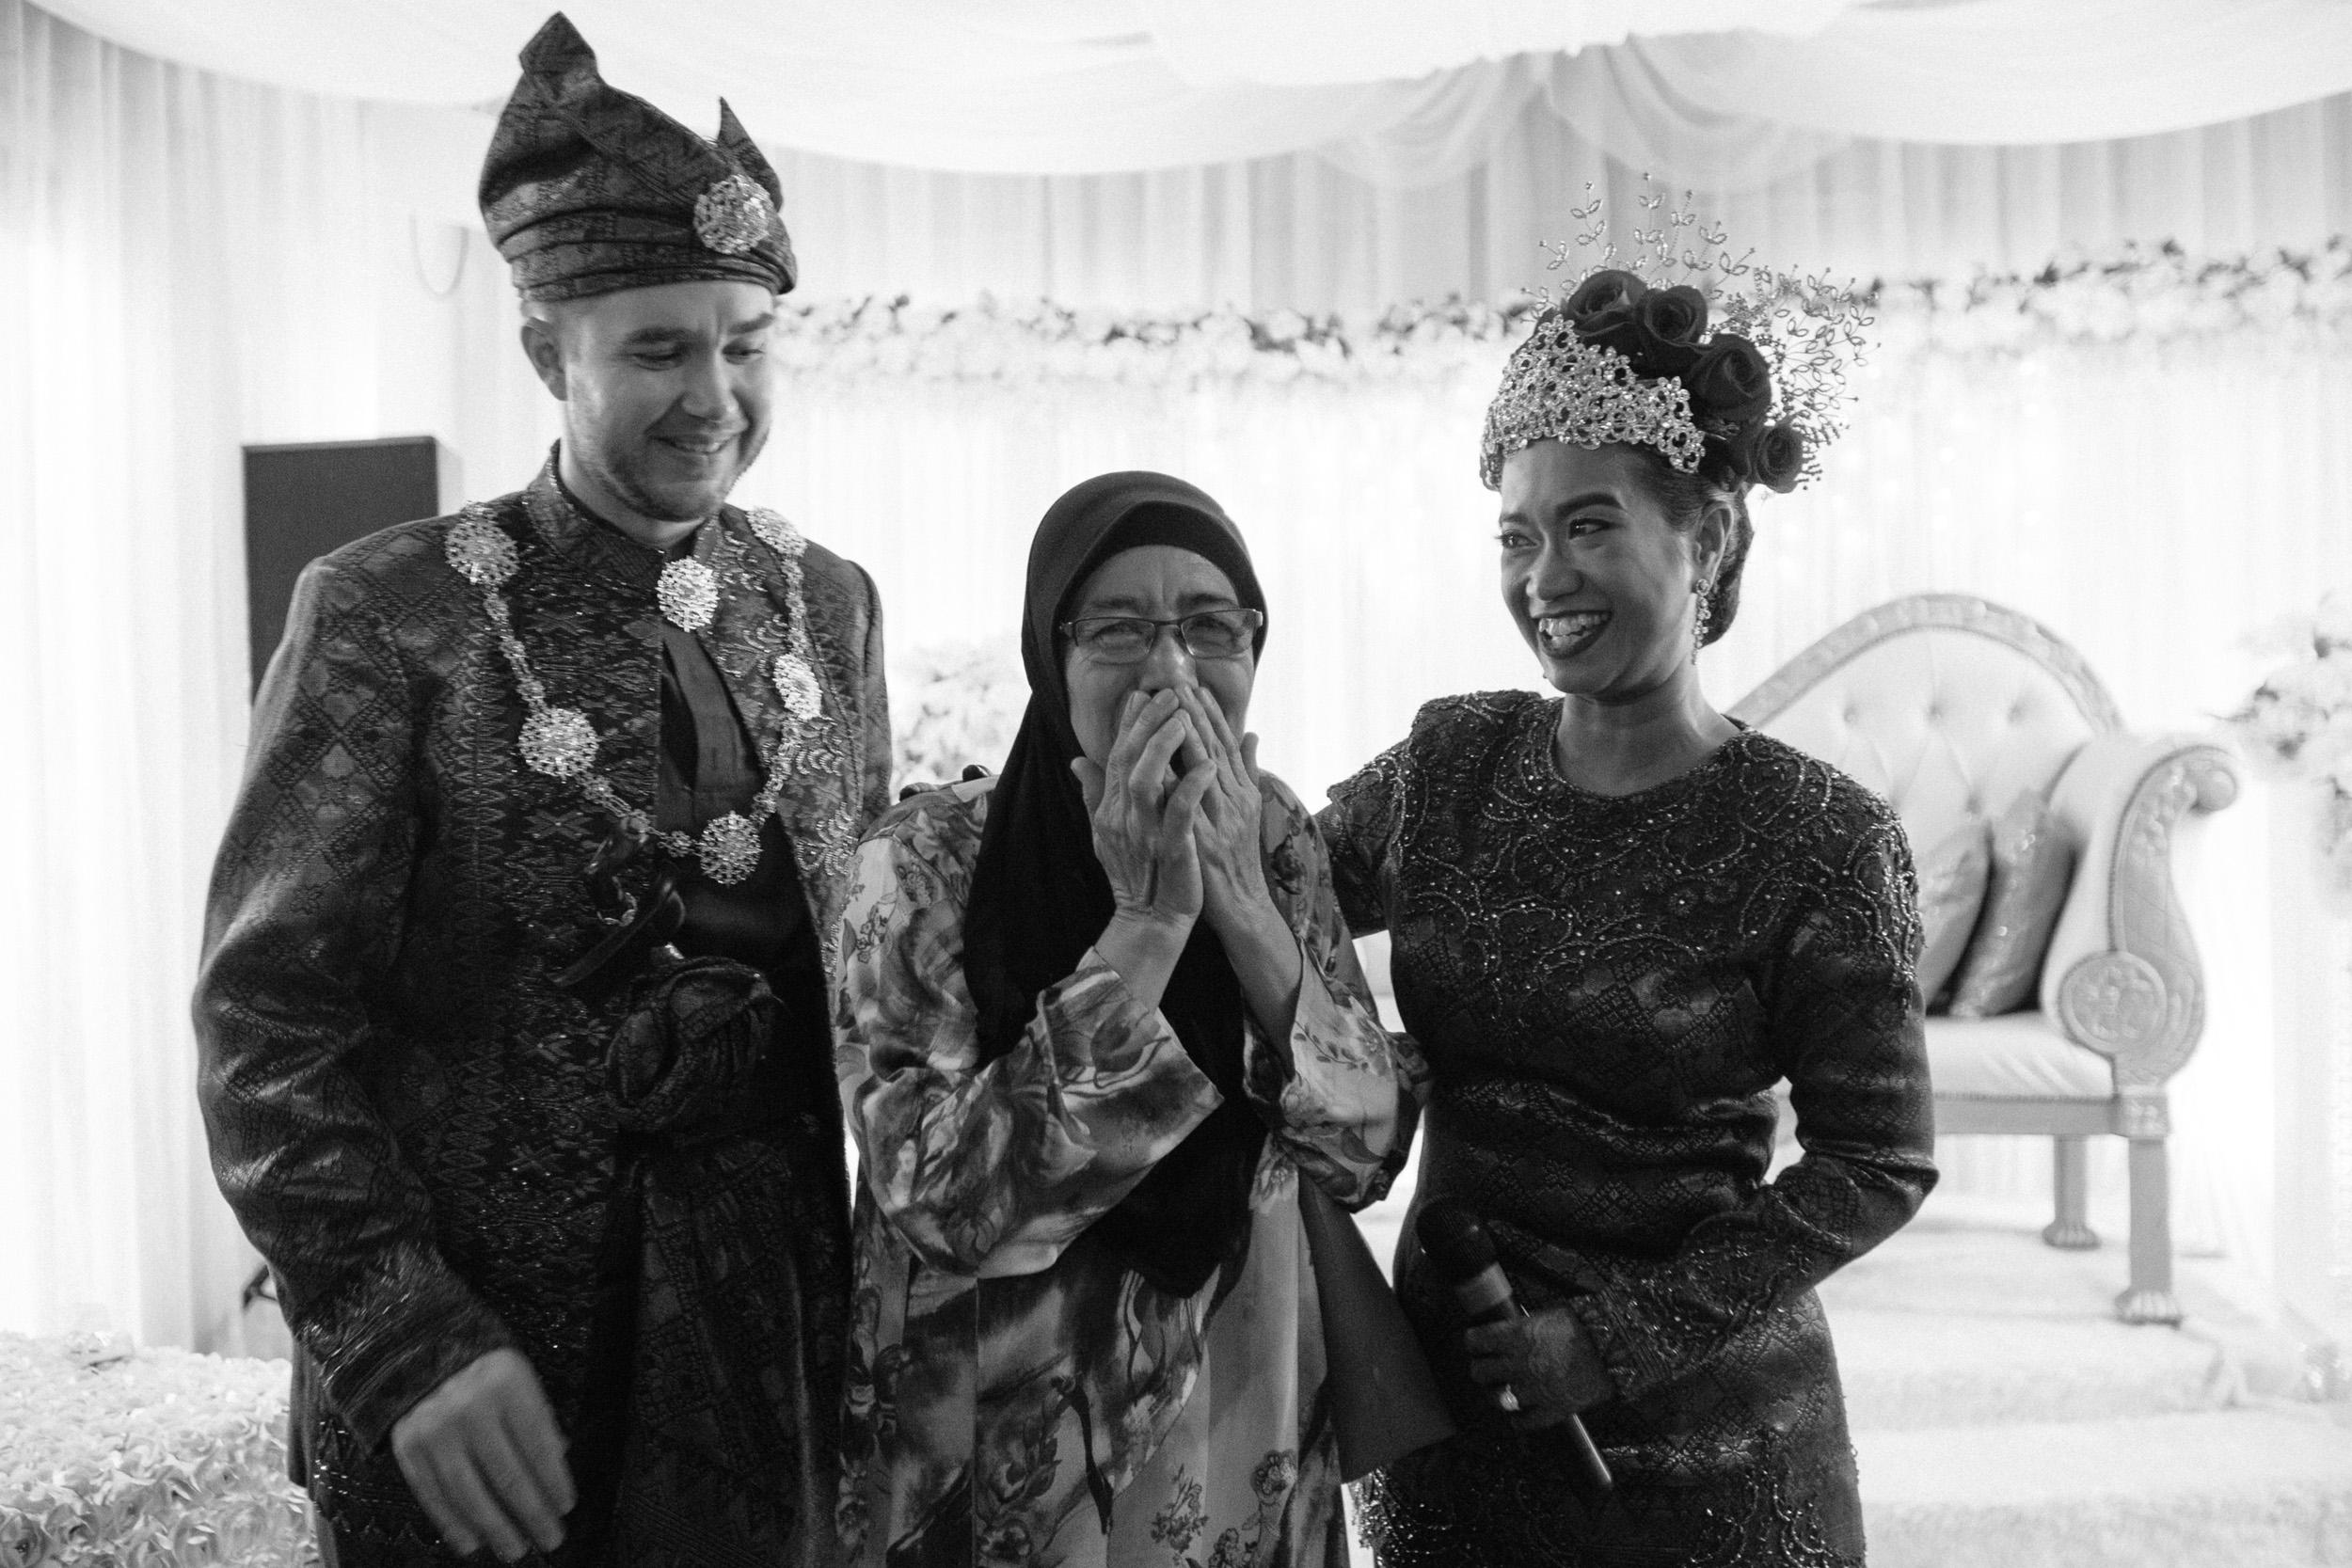 singapore-wedding-photographer-photography-wmt2017-136.jpg